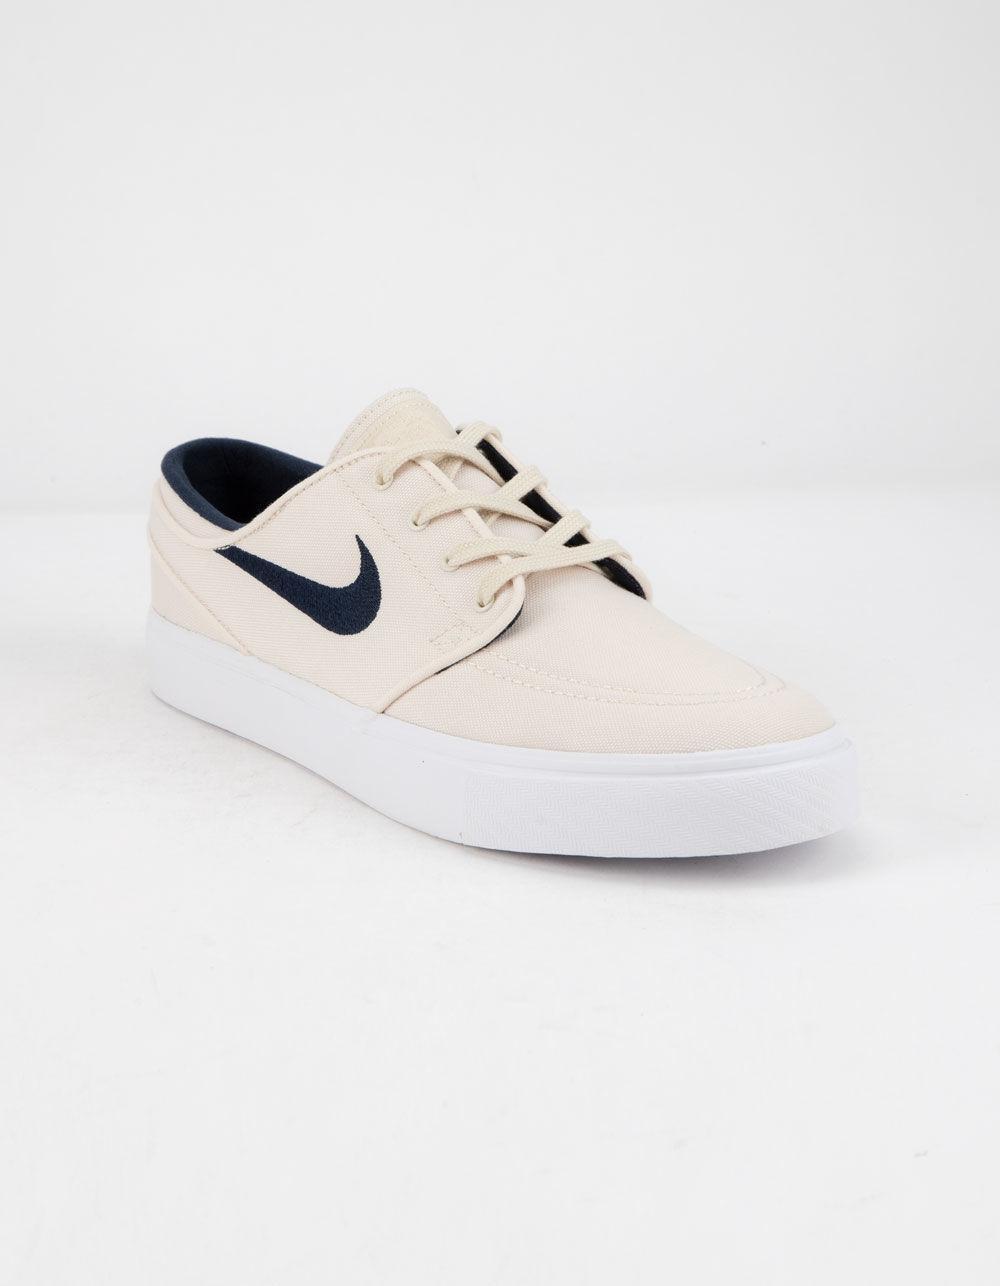 9a0a61ba219f Lyst - Nike Sb Zoom Stefan Janoski Canvas Light Cream   Obsidian White Mens  Shoes in White for Men